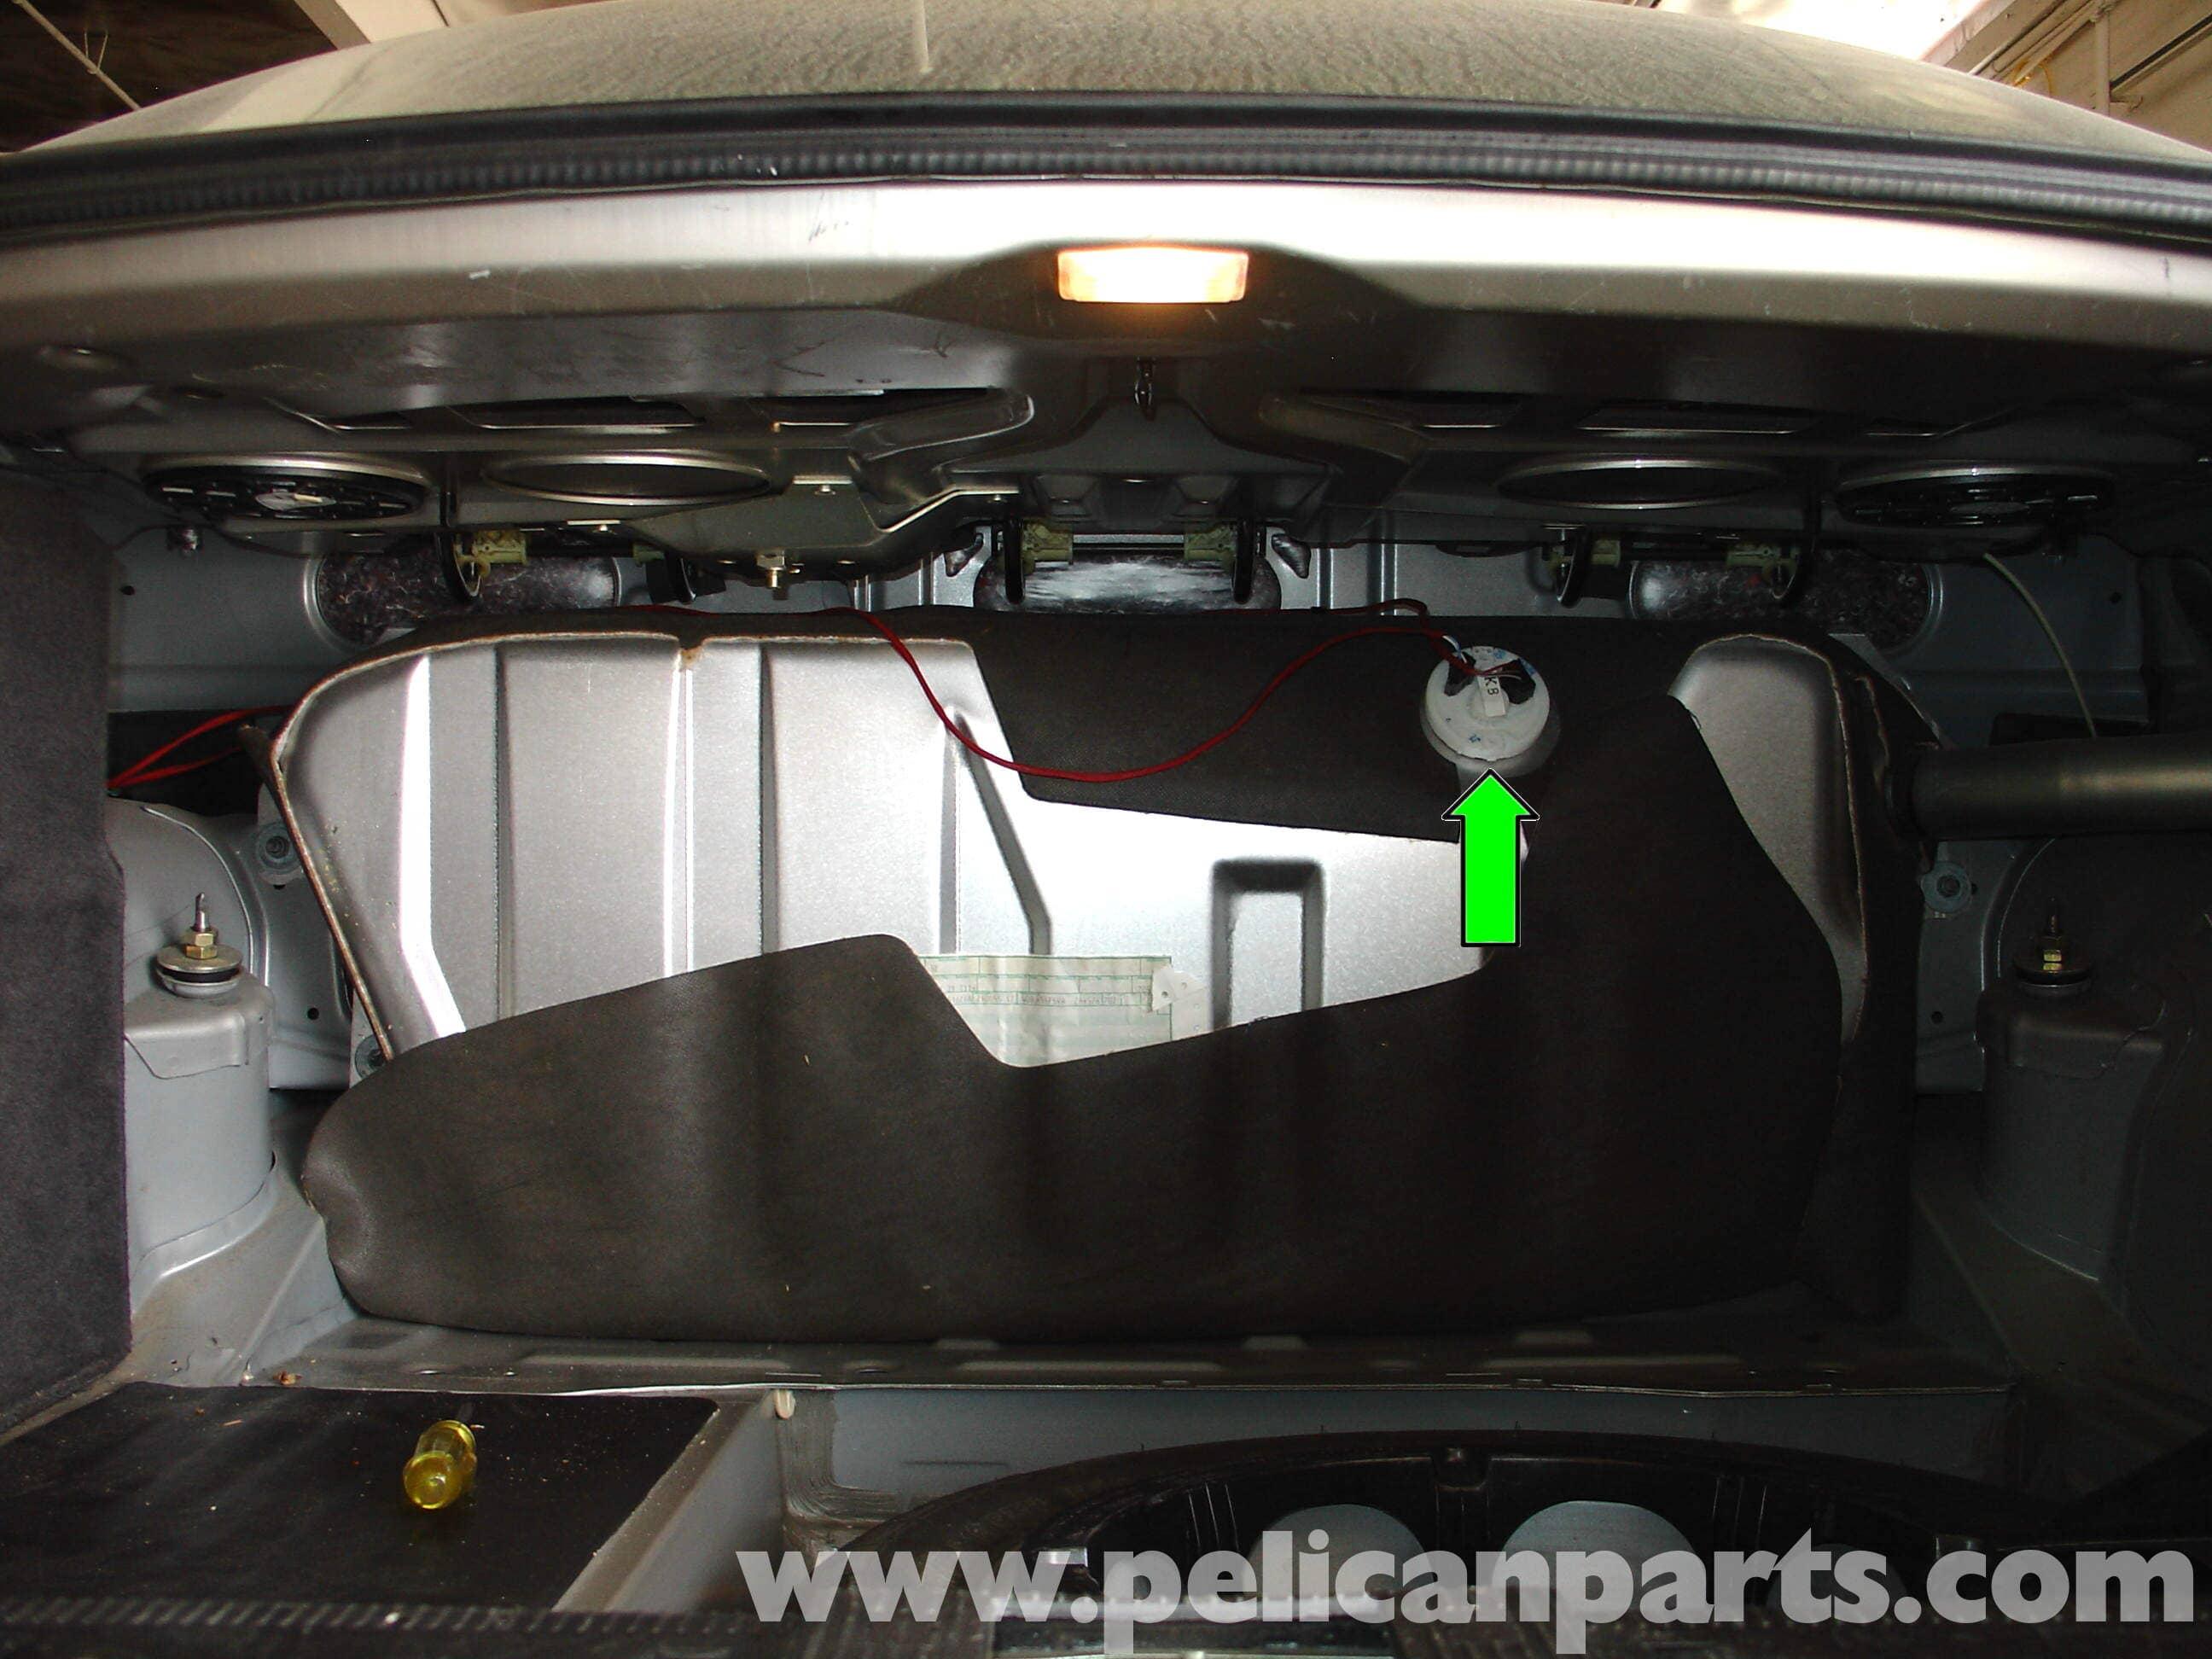 Mercedes Benz W210 Fuel Level Sender Replacement 1996 03